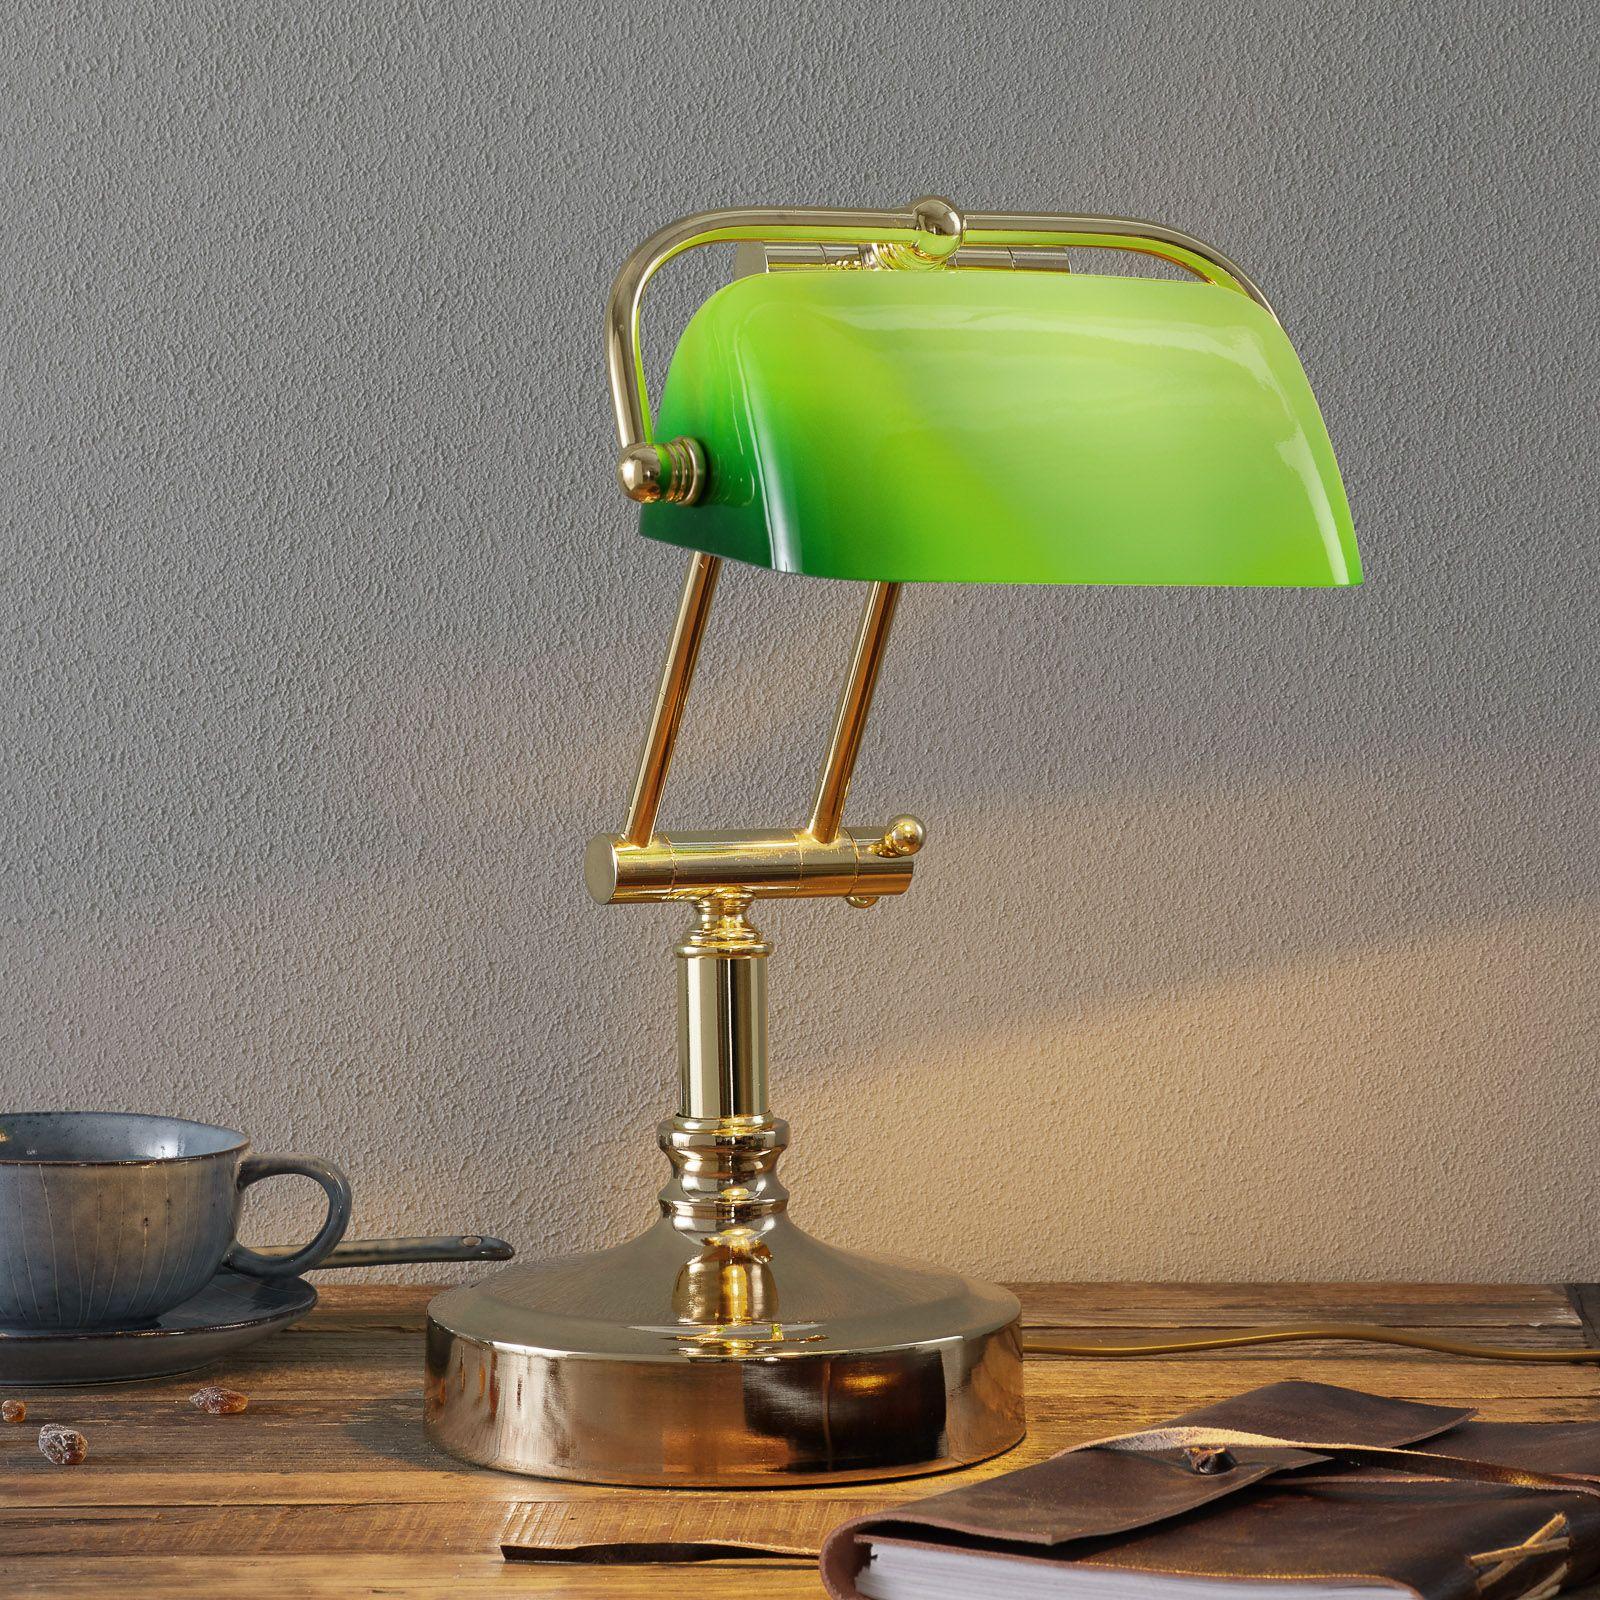 Banker S Lamp Steve With Green Lampshade In 2020 Gruner Lampenschirm Led Birnen Lampe